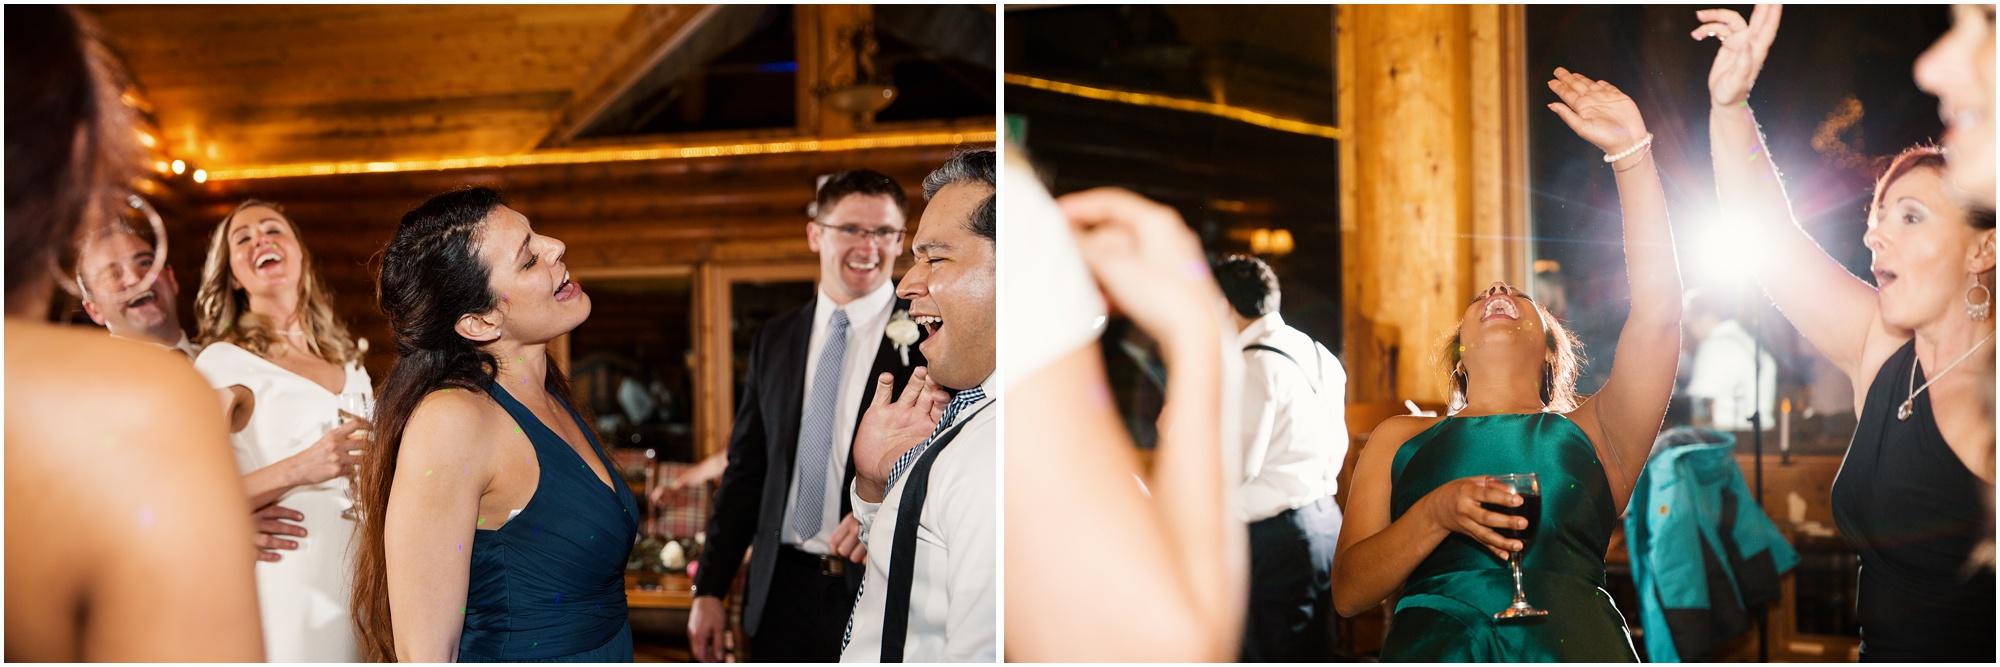 Breckenridge-Wedding-Photographer_0081.jpg